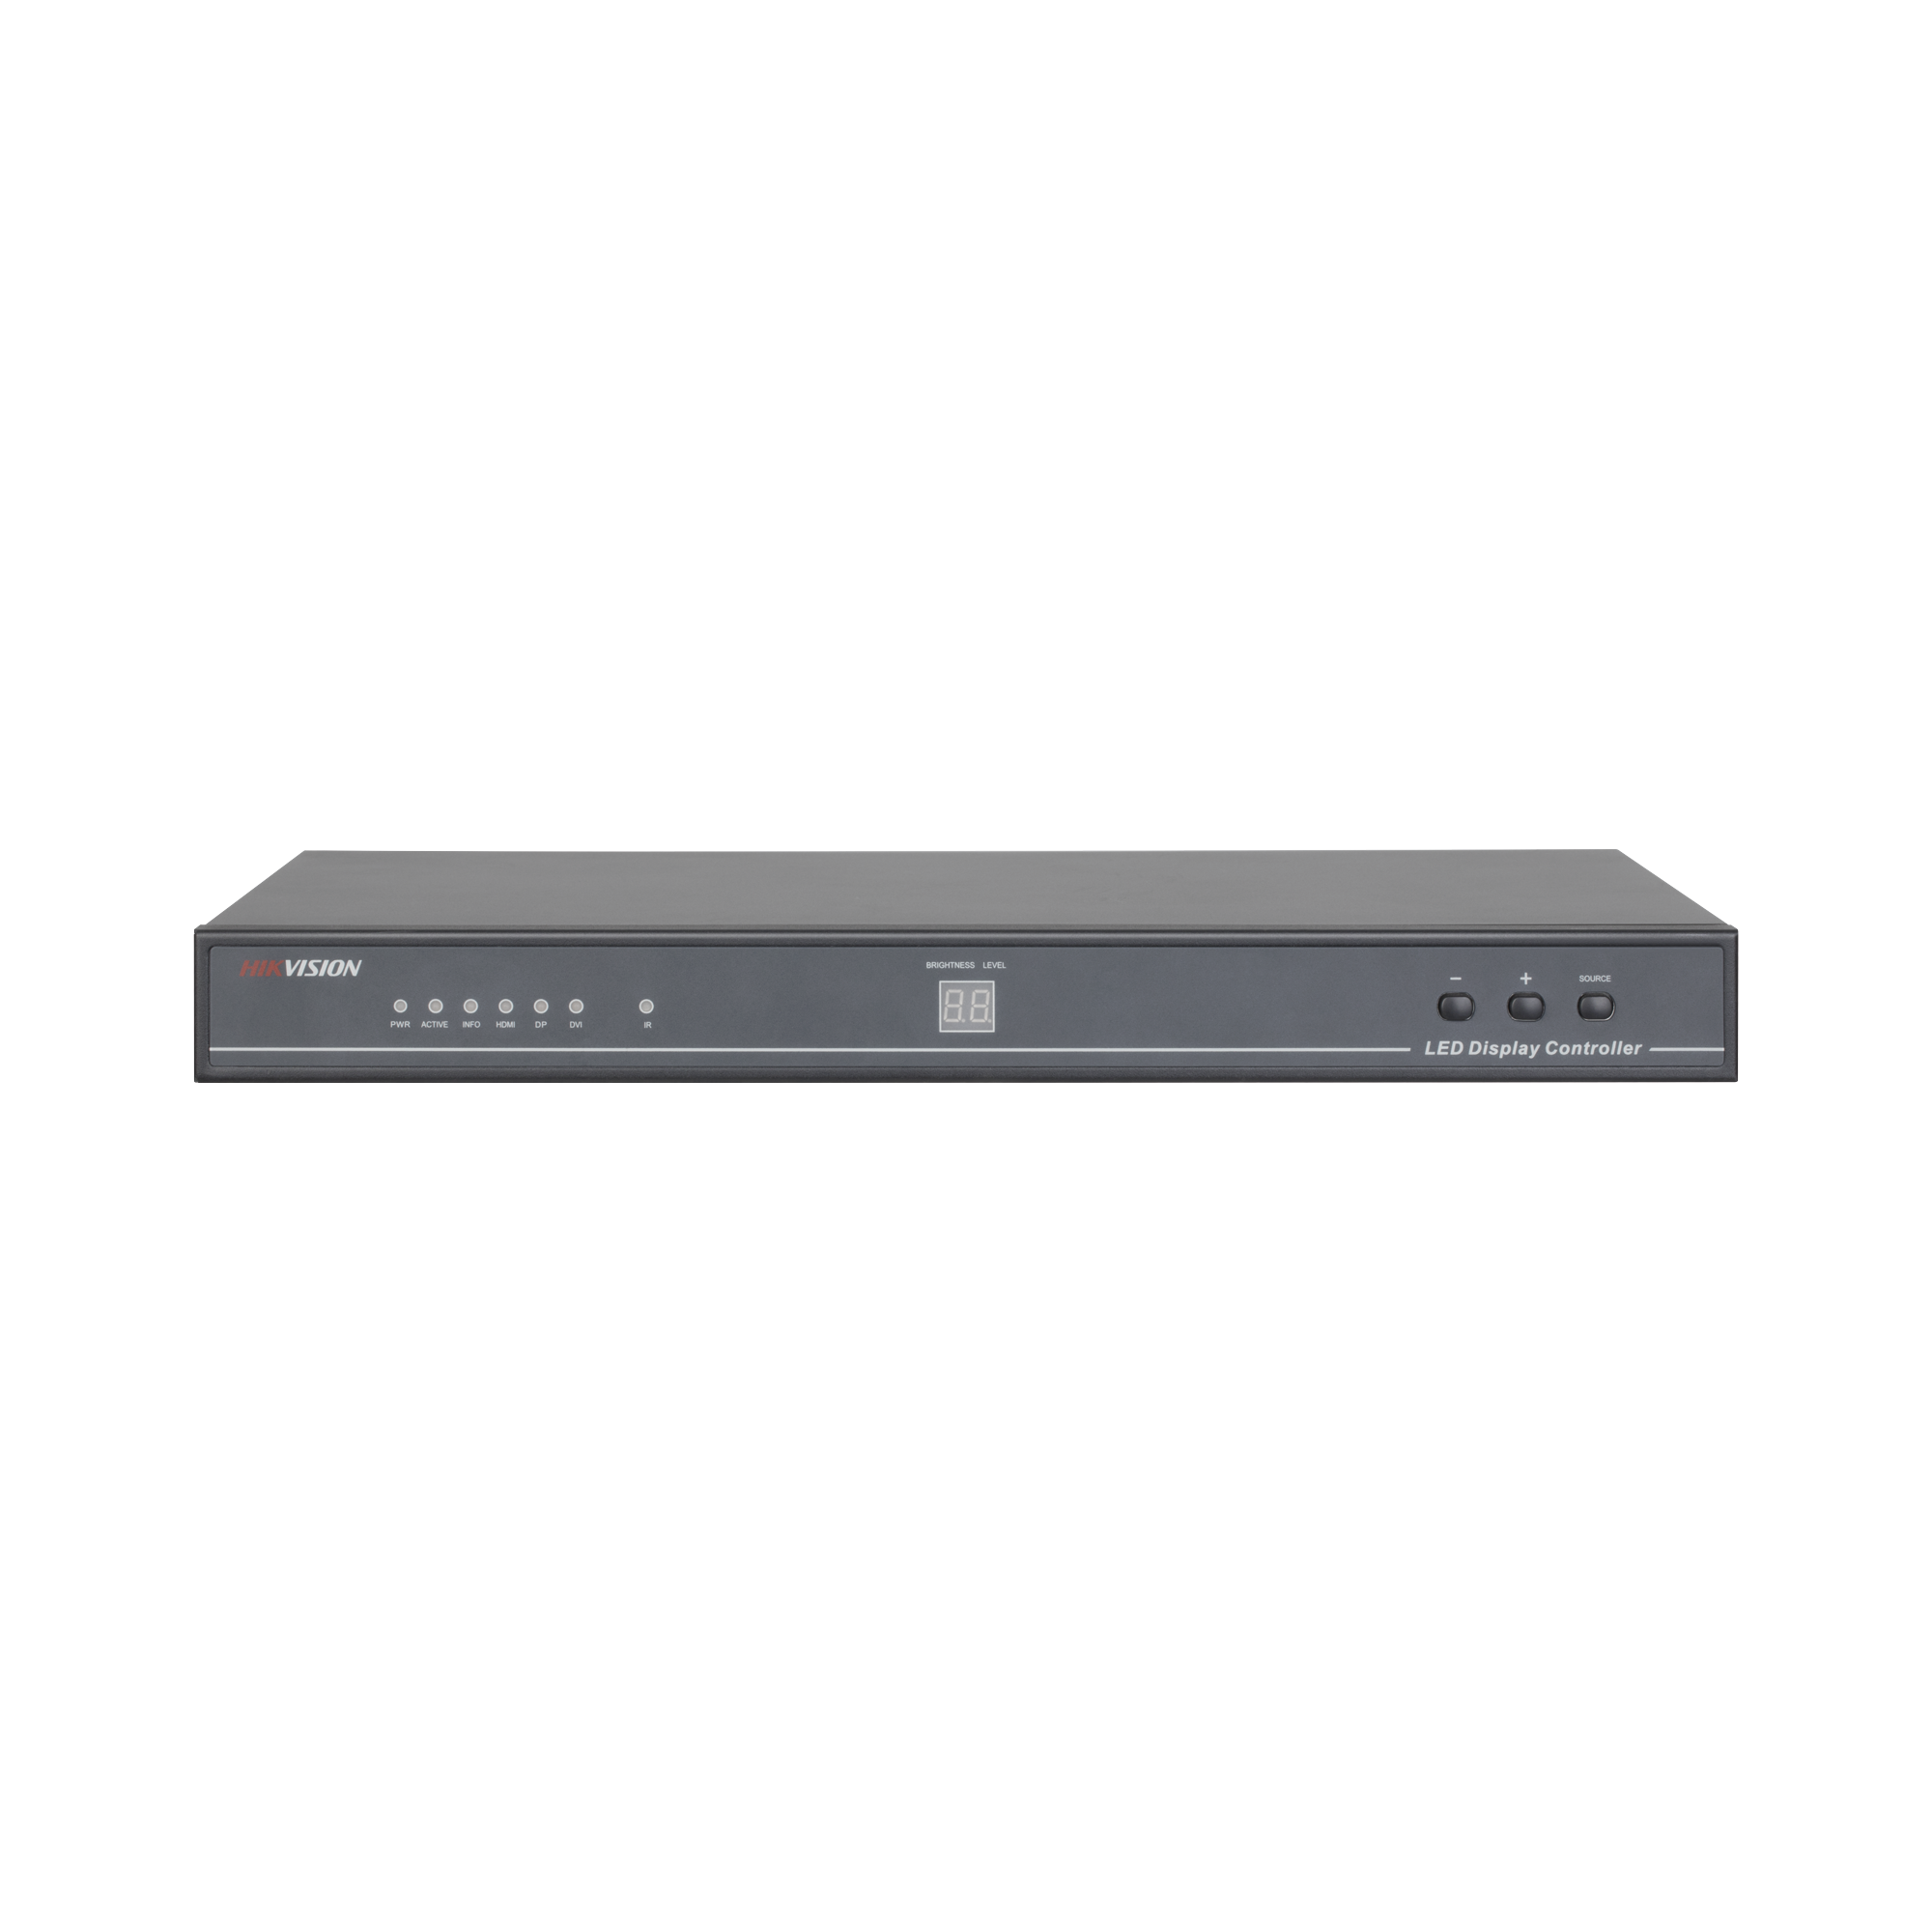 Controlador para VIDEOWALL  / FULL HD (1920 X 1080) /Compatible con Pantallas LED Serie DS-D44